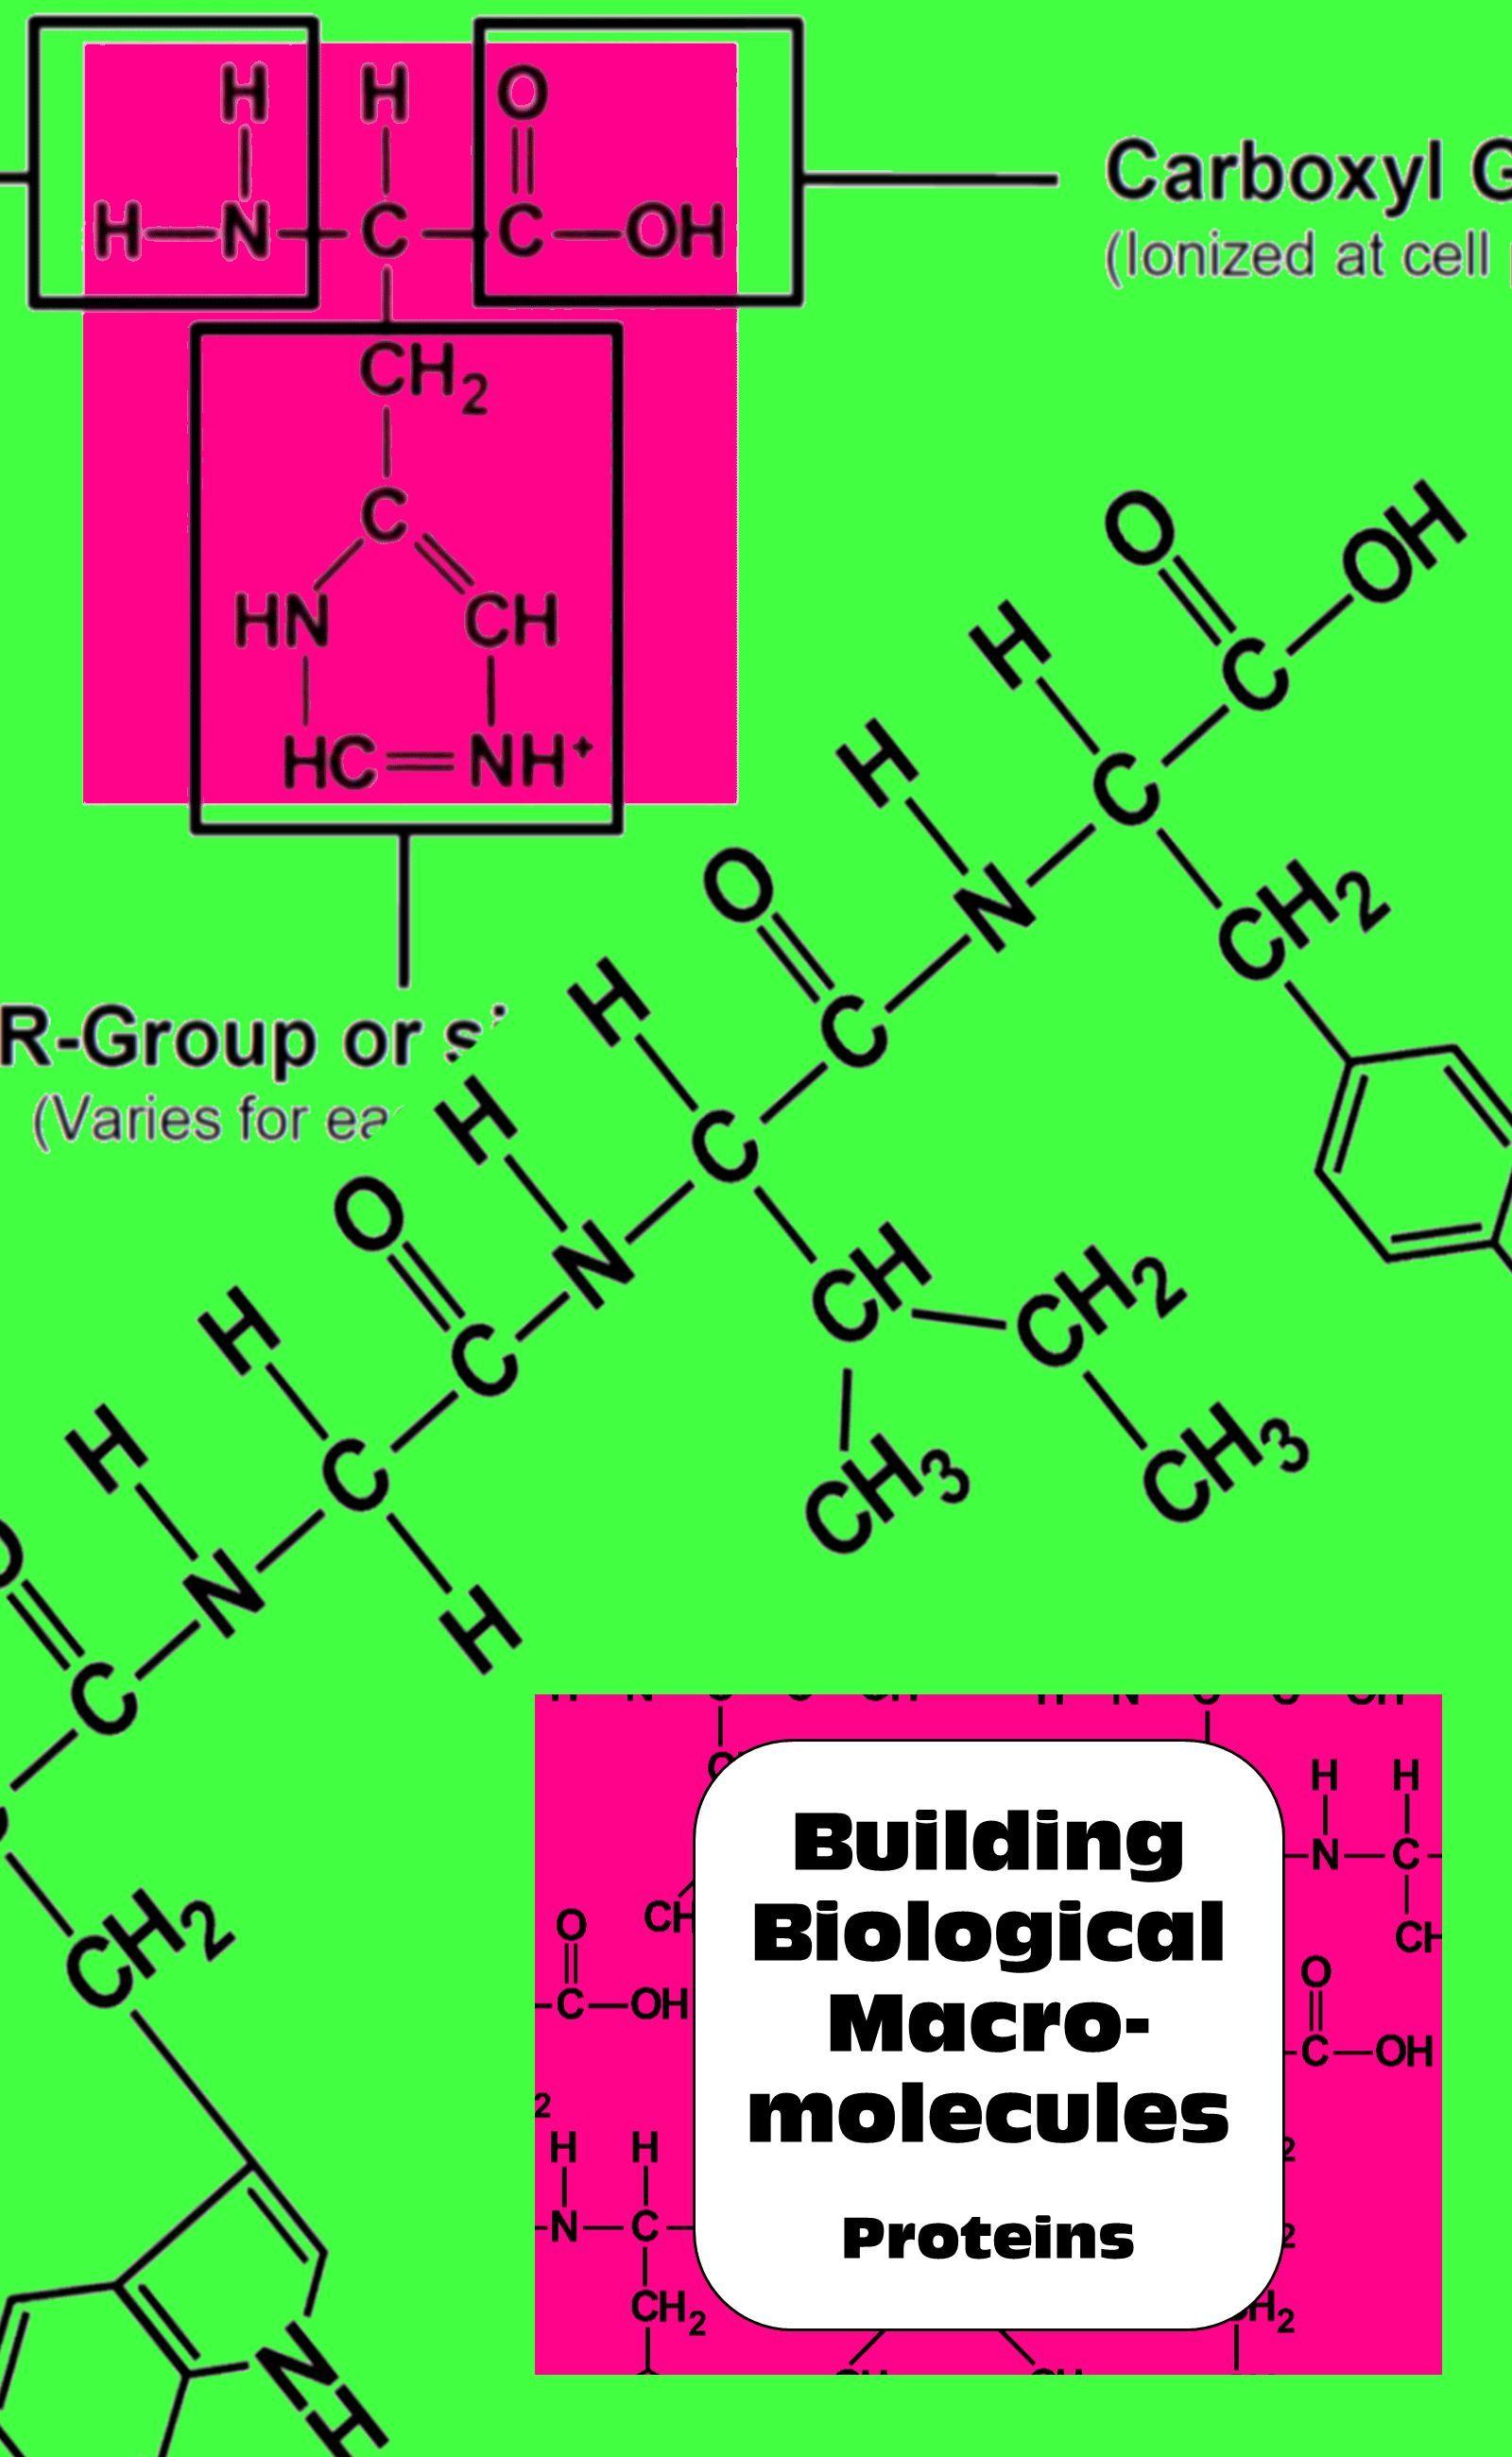 Proteins Biochemistry Building Biological Macromolecules High School Biology